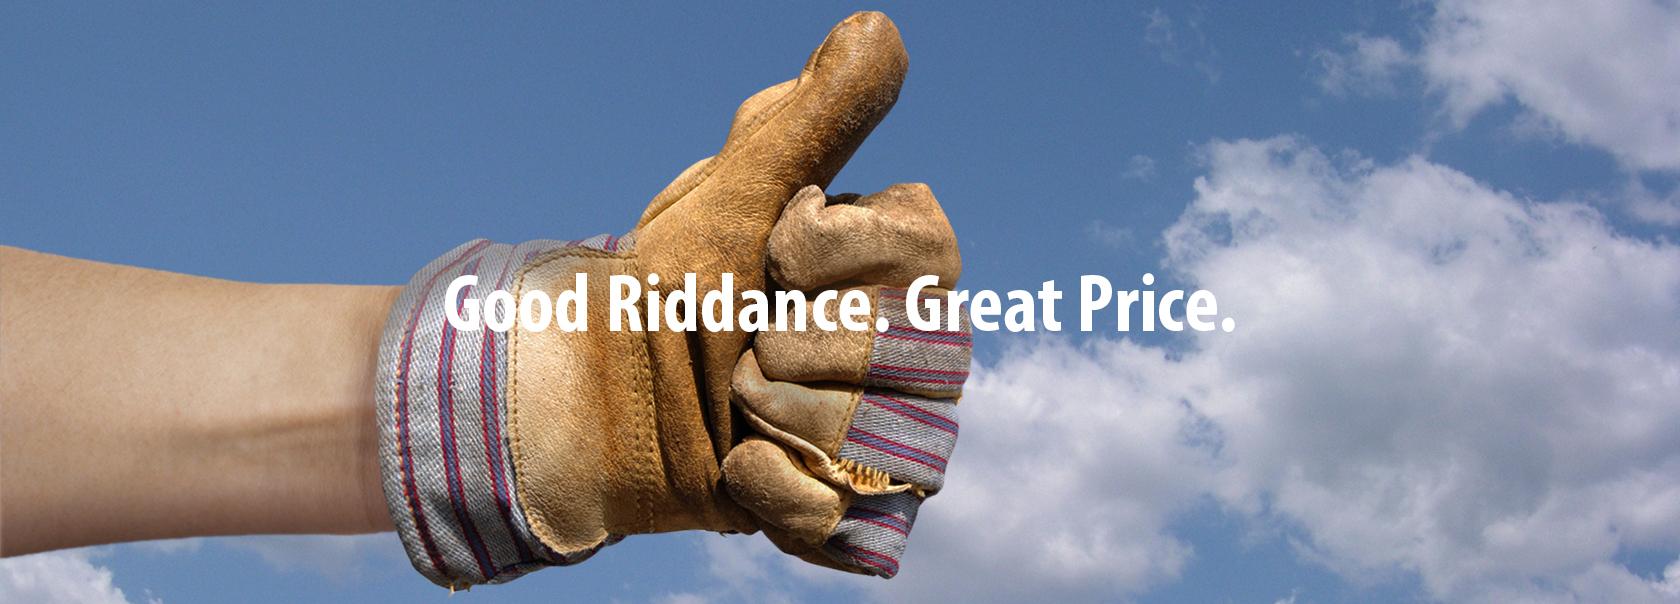 Seasons Debris Removal Good Riddance. Great Price.